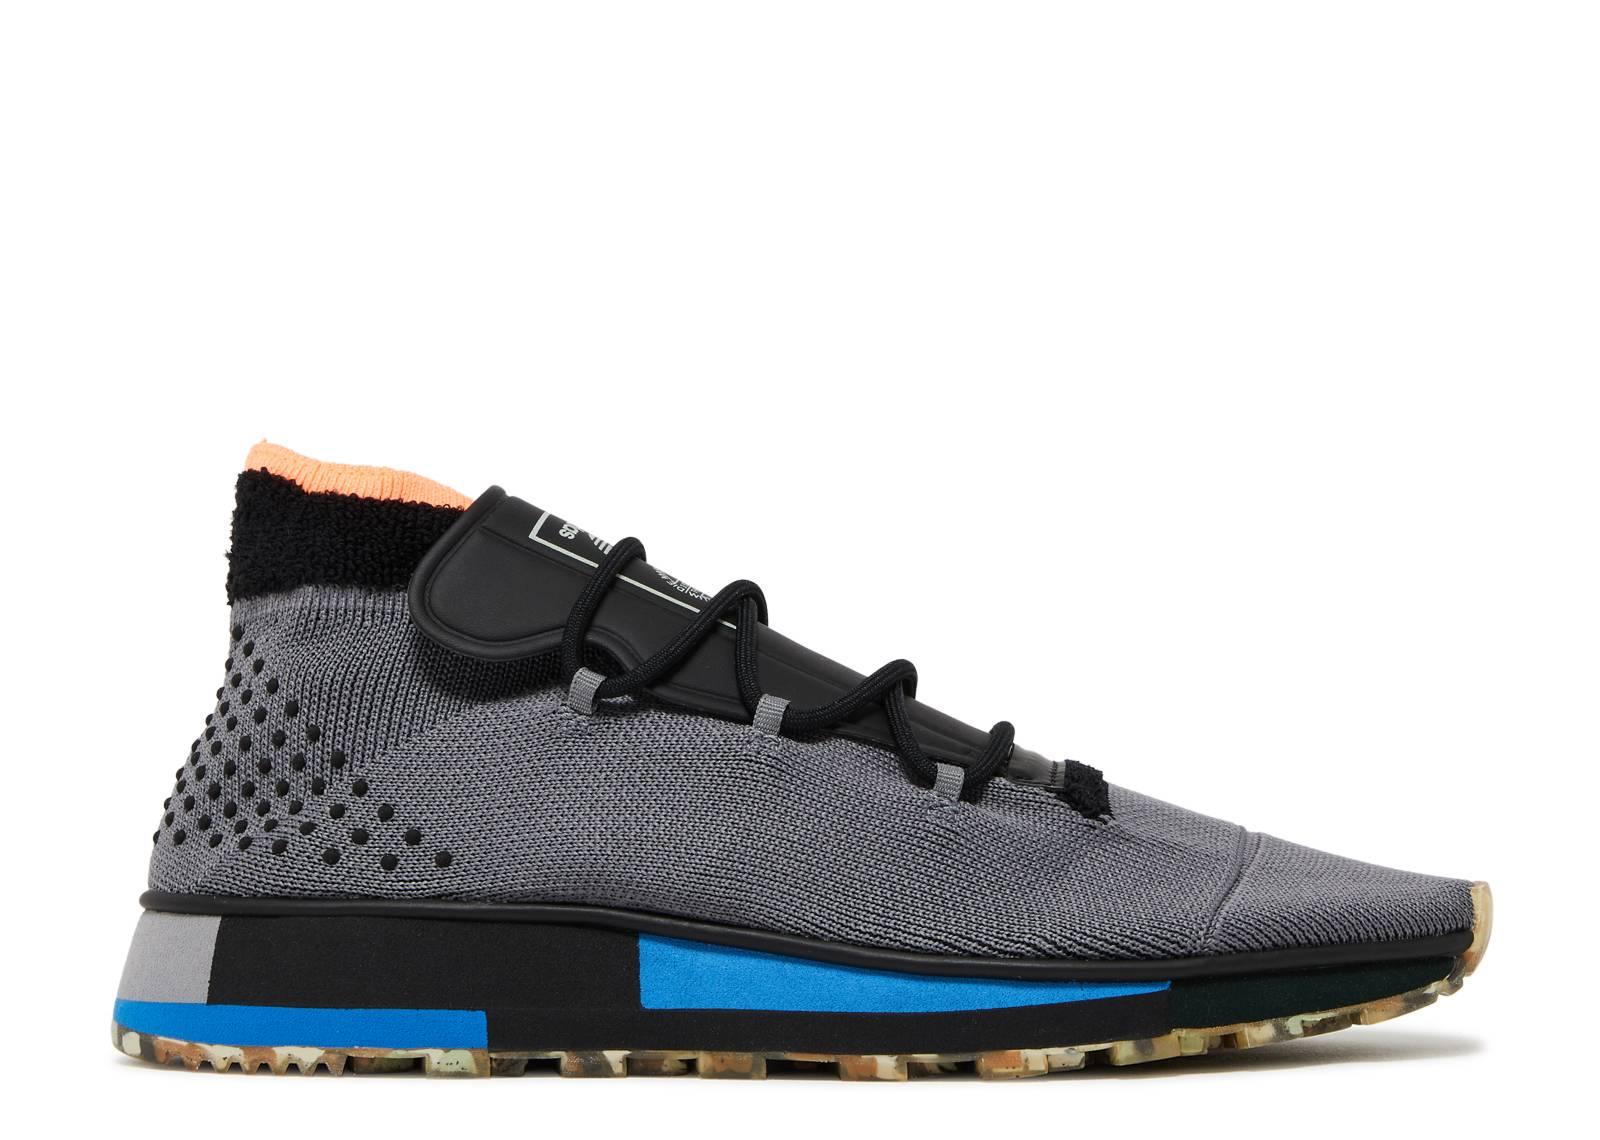 hot sale online 26c4a 215ec Aw Run Mid - Adidas - ac6844 - stcrag/core black/ glow ...